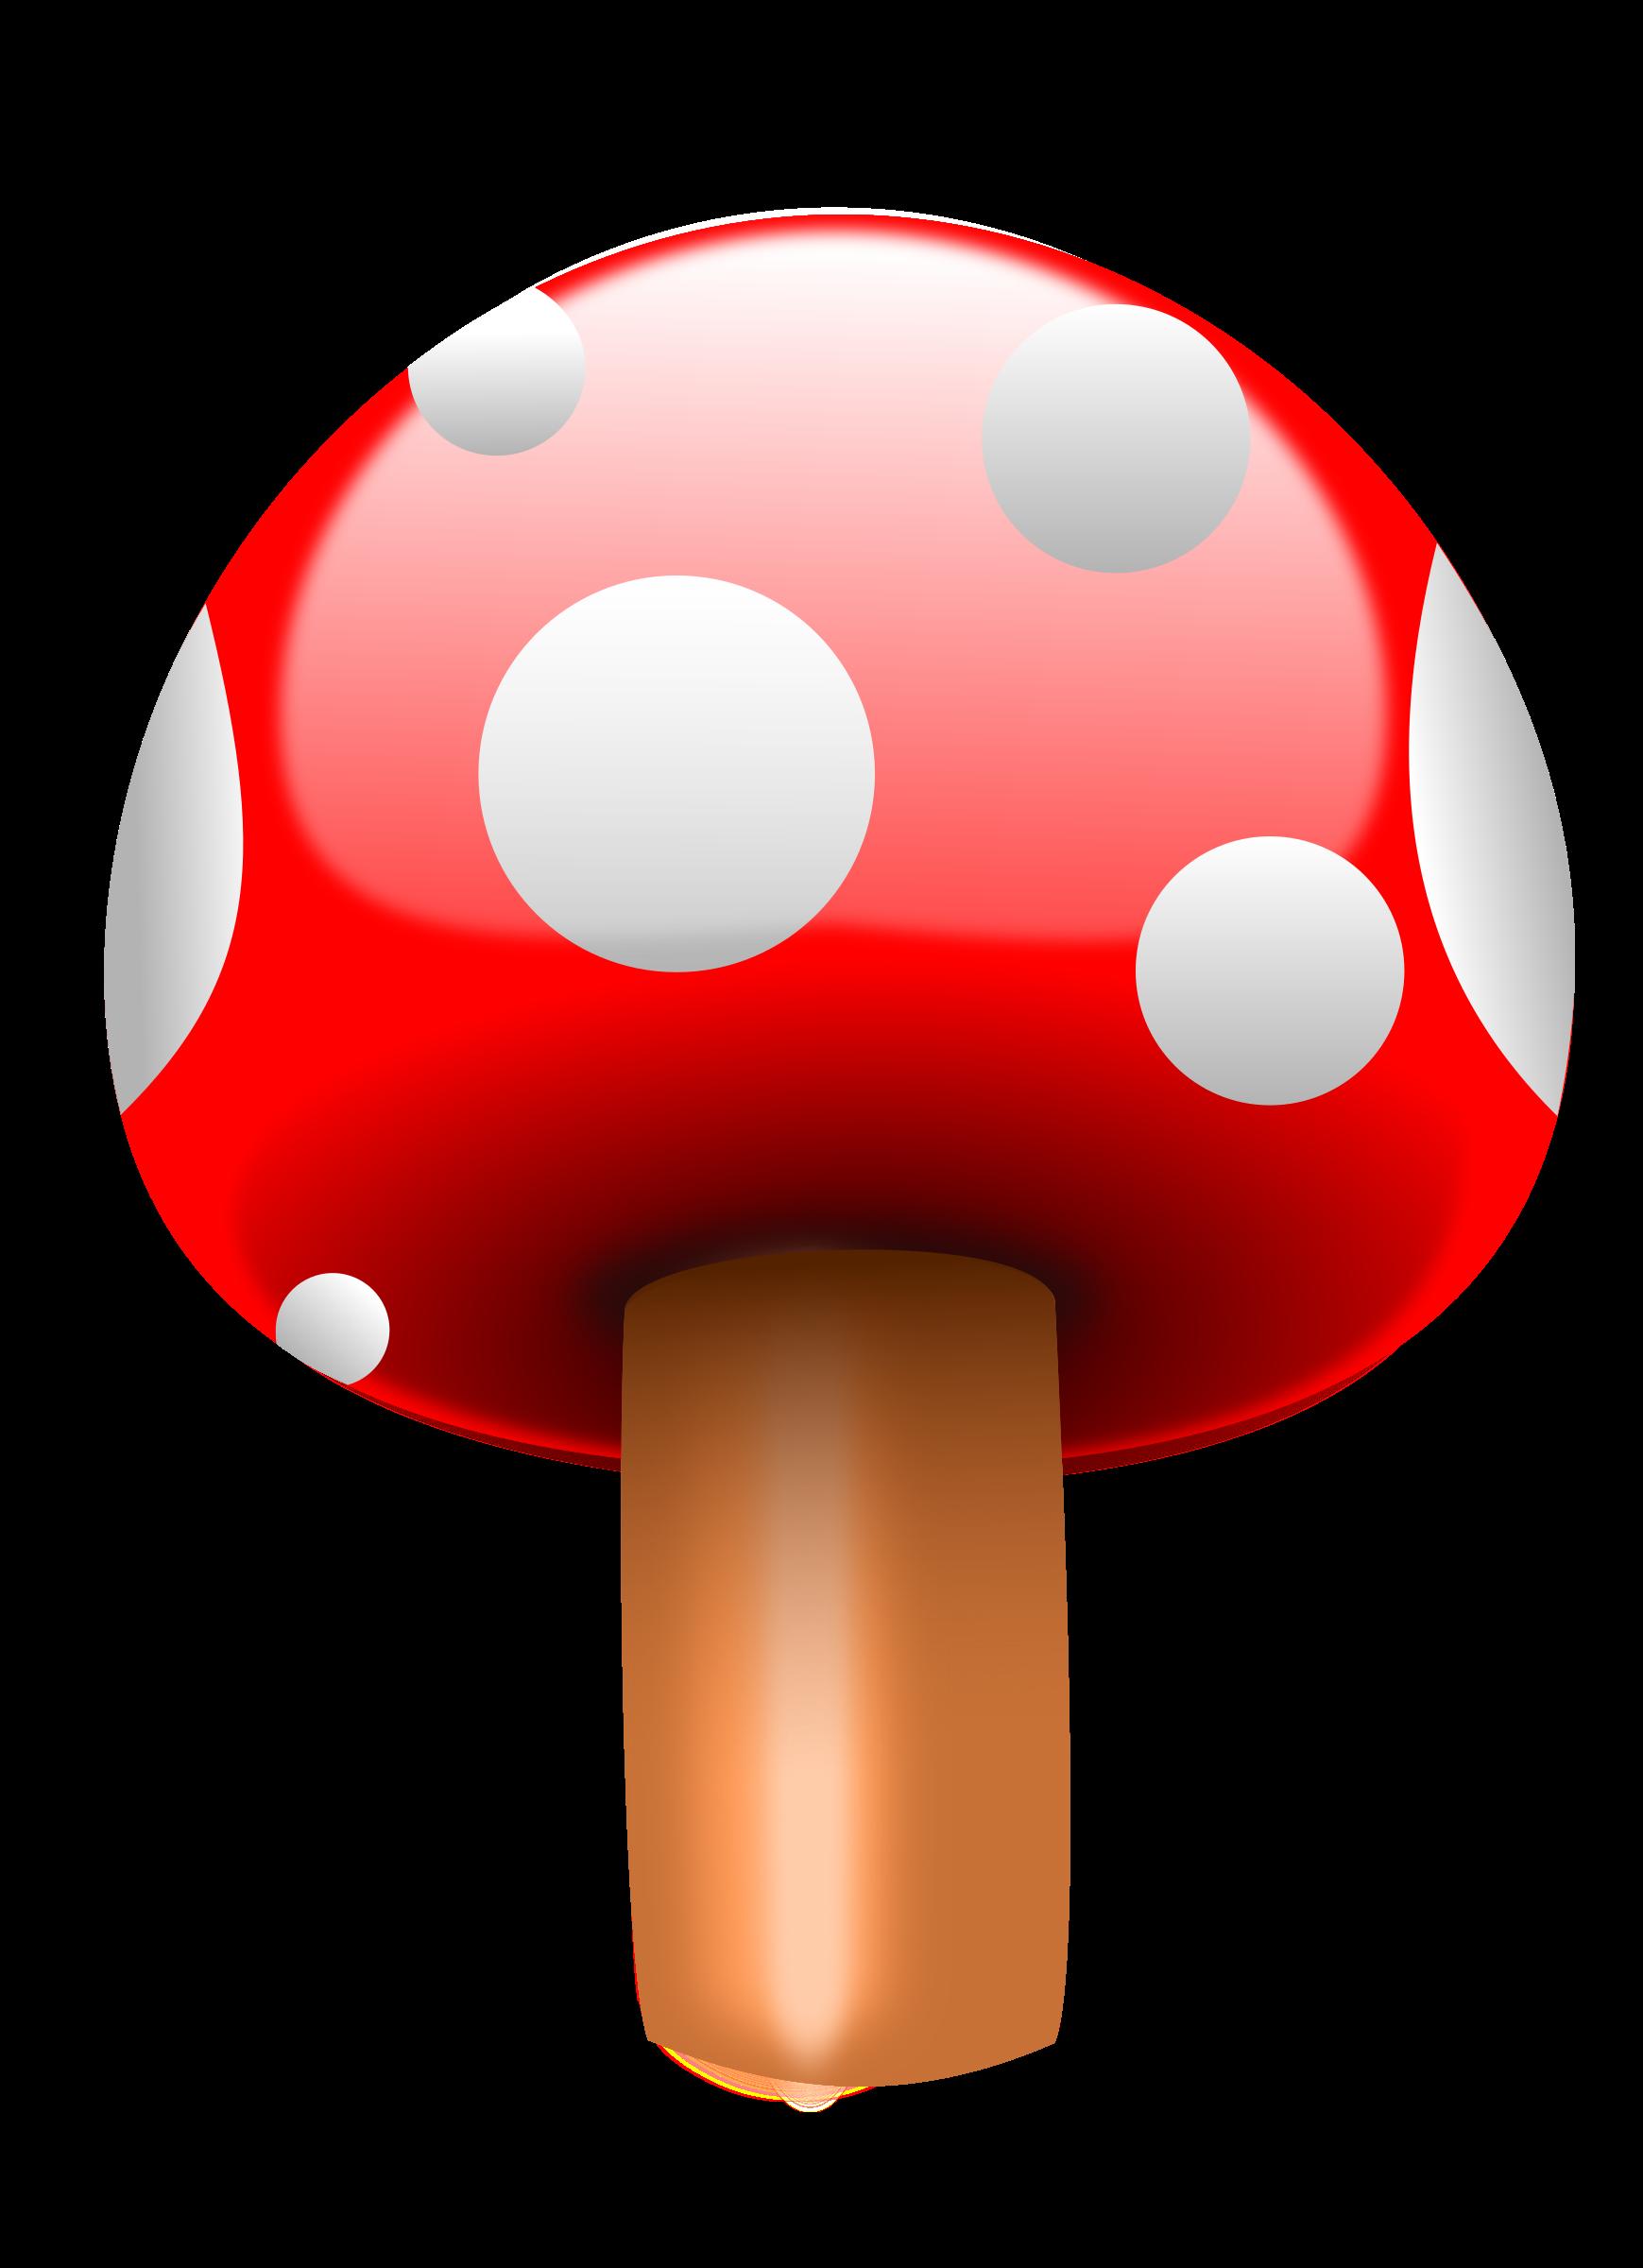 One big image png. Clipart food mushroom